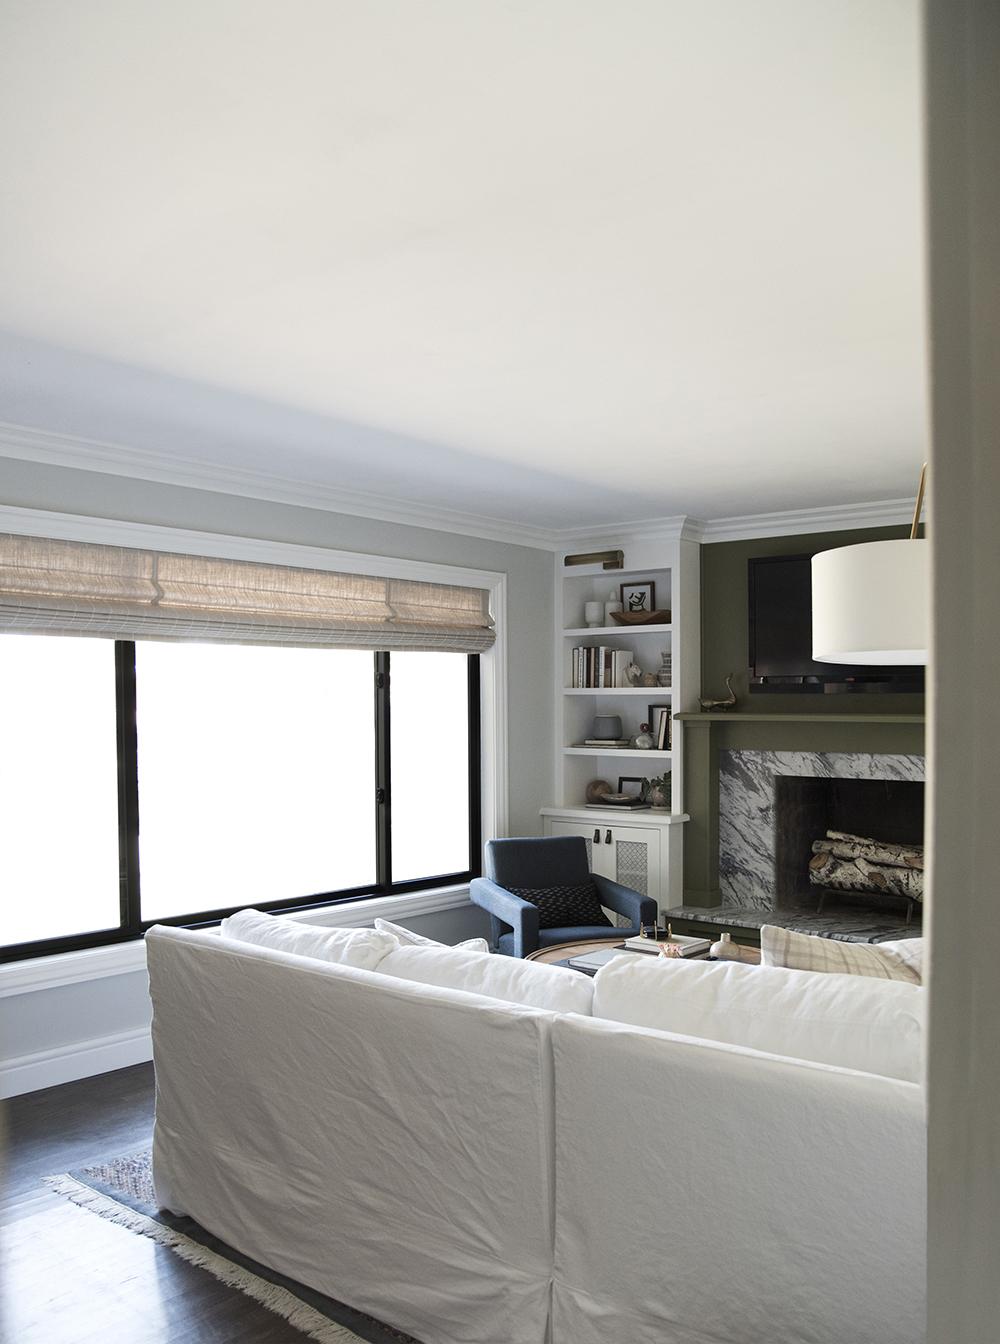 Get the Look - Living Room